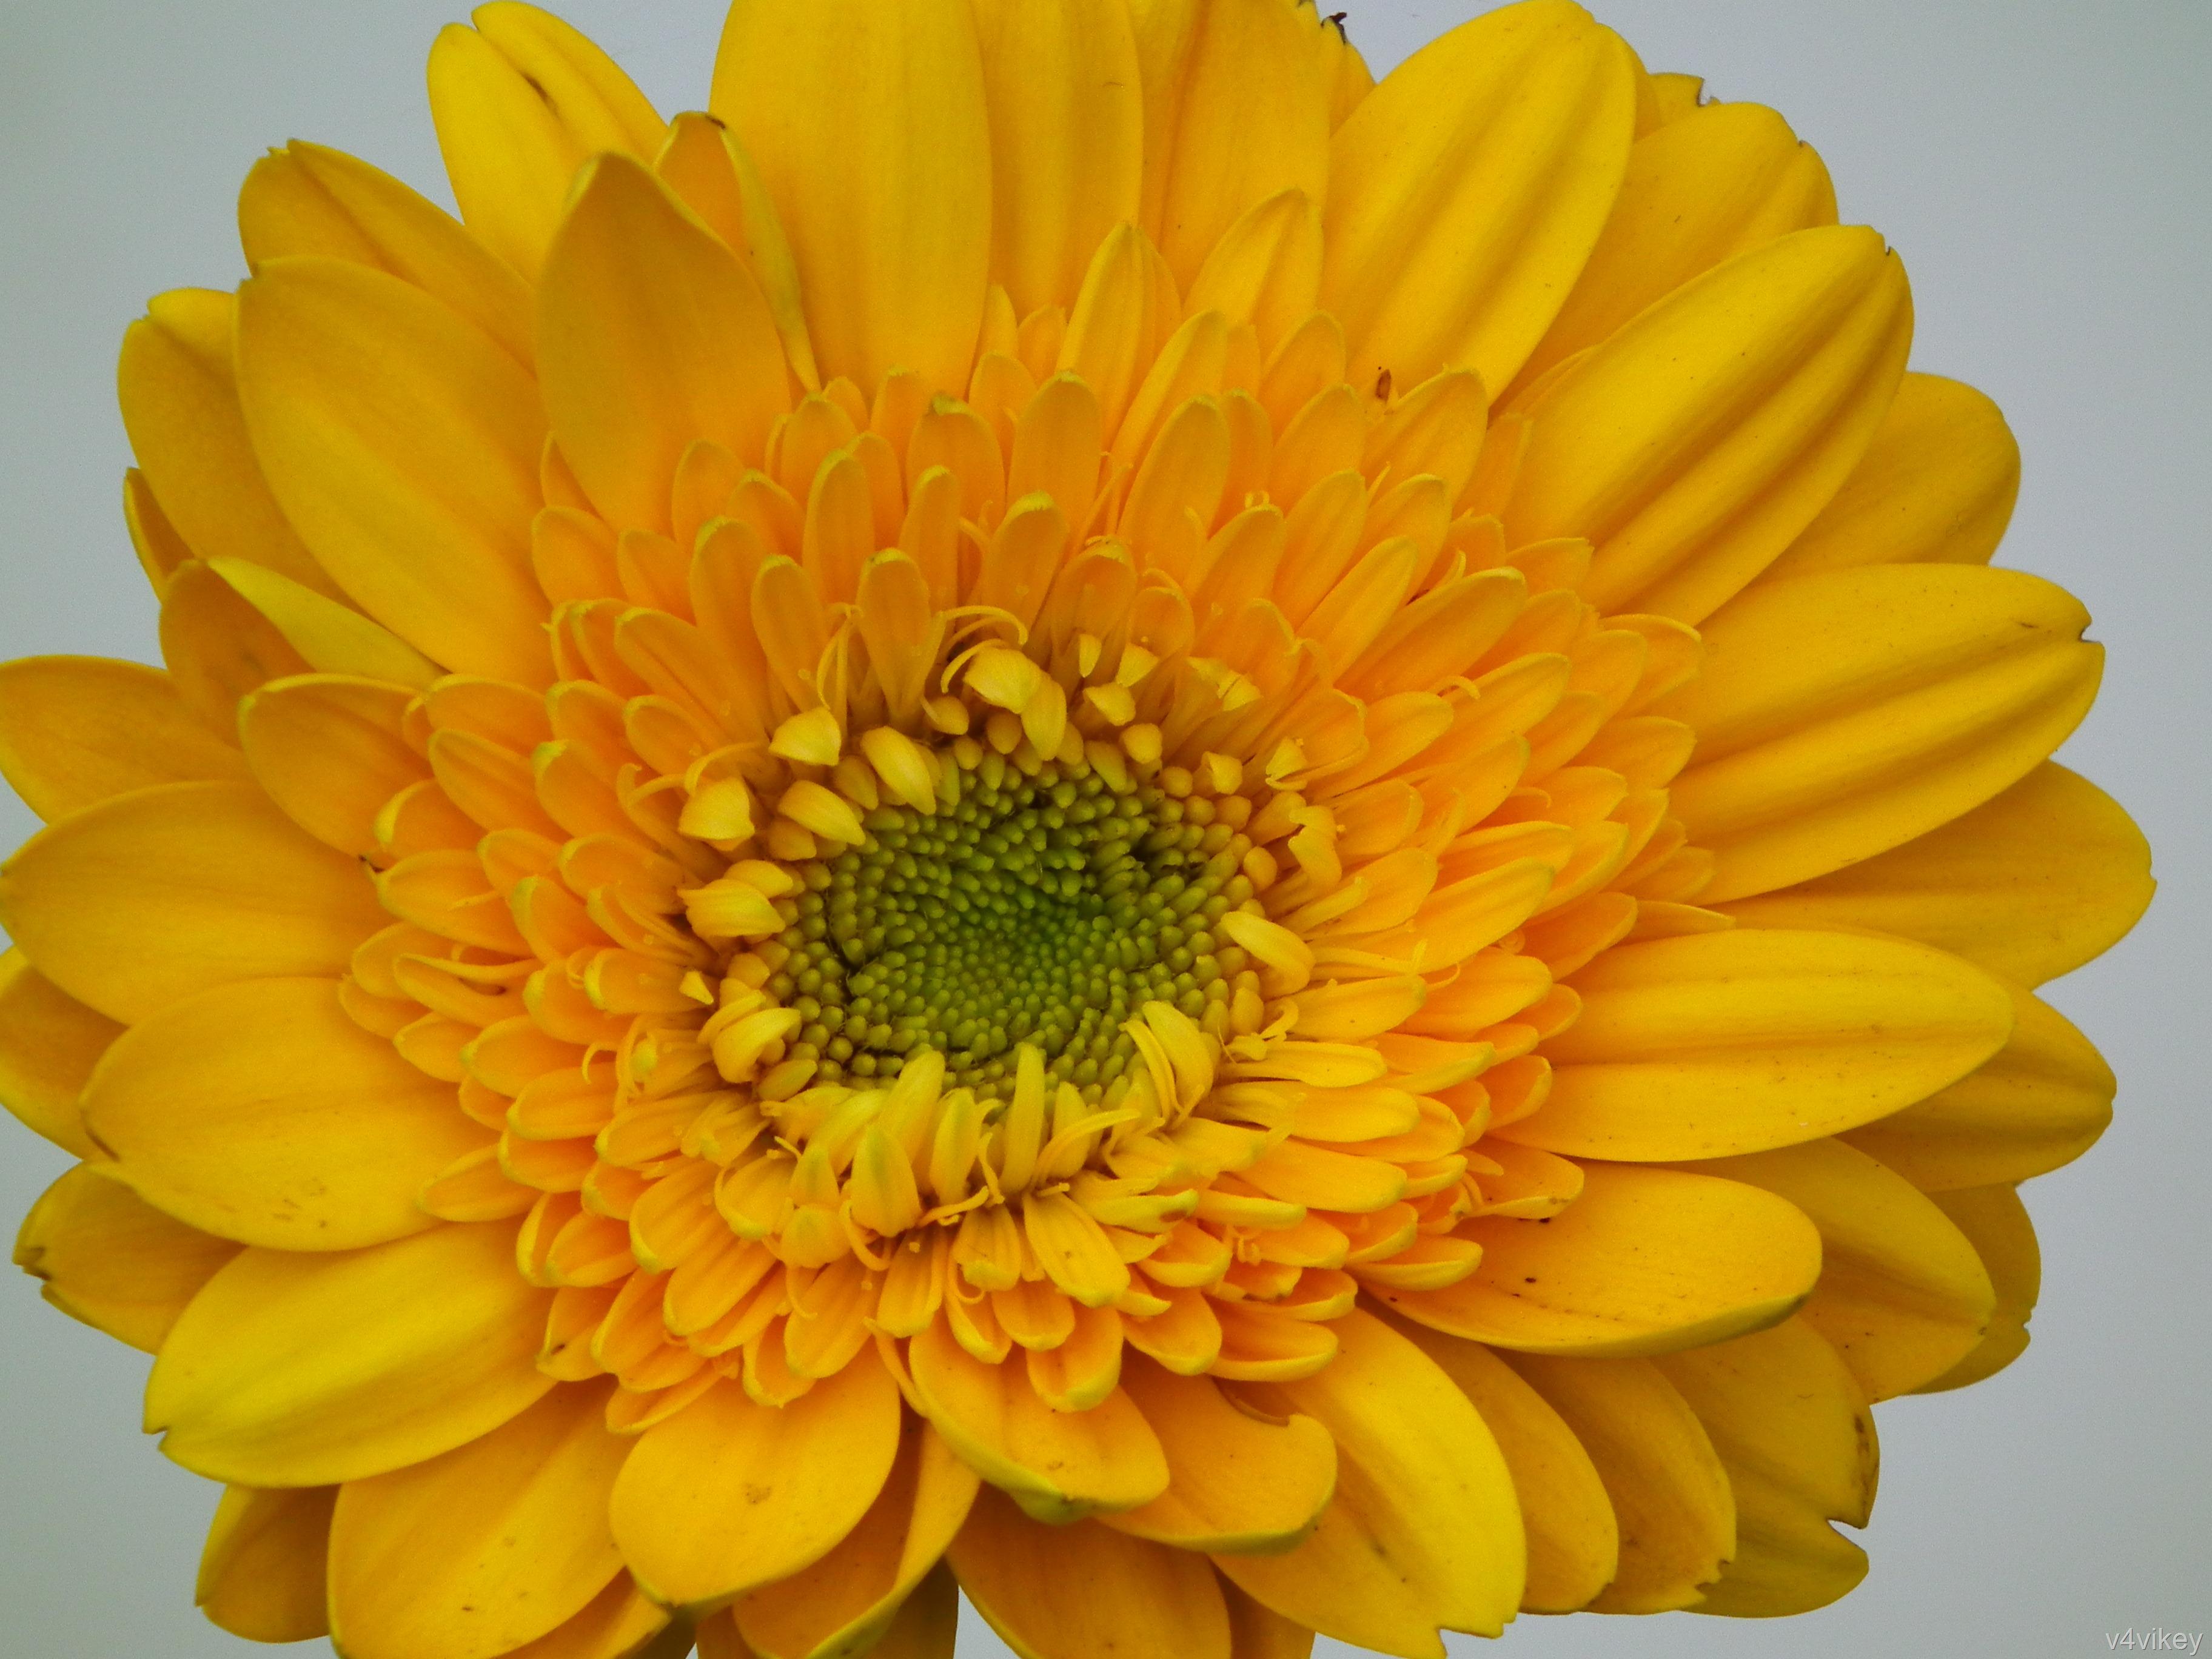 Delight daisy flower wallpaper tadka daisies are also a classic symbol of beauty izmirmasajfo